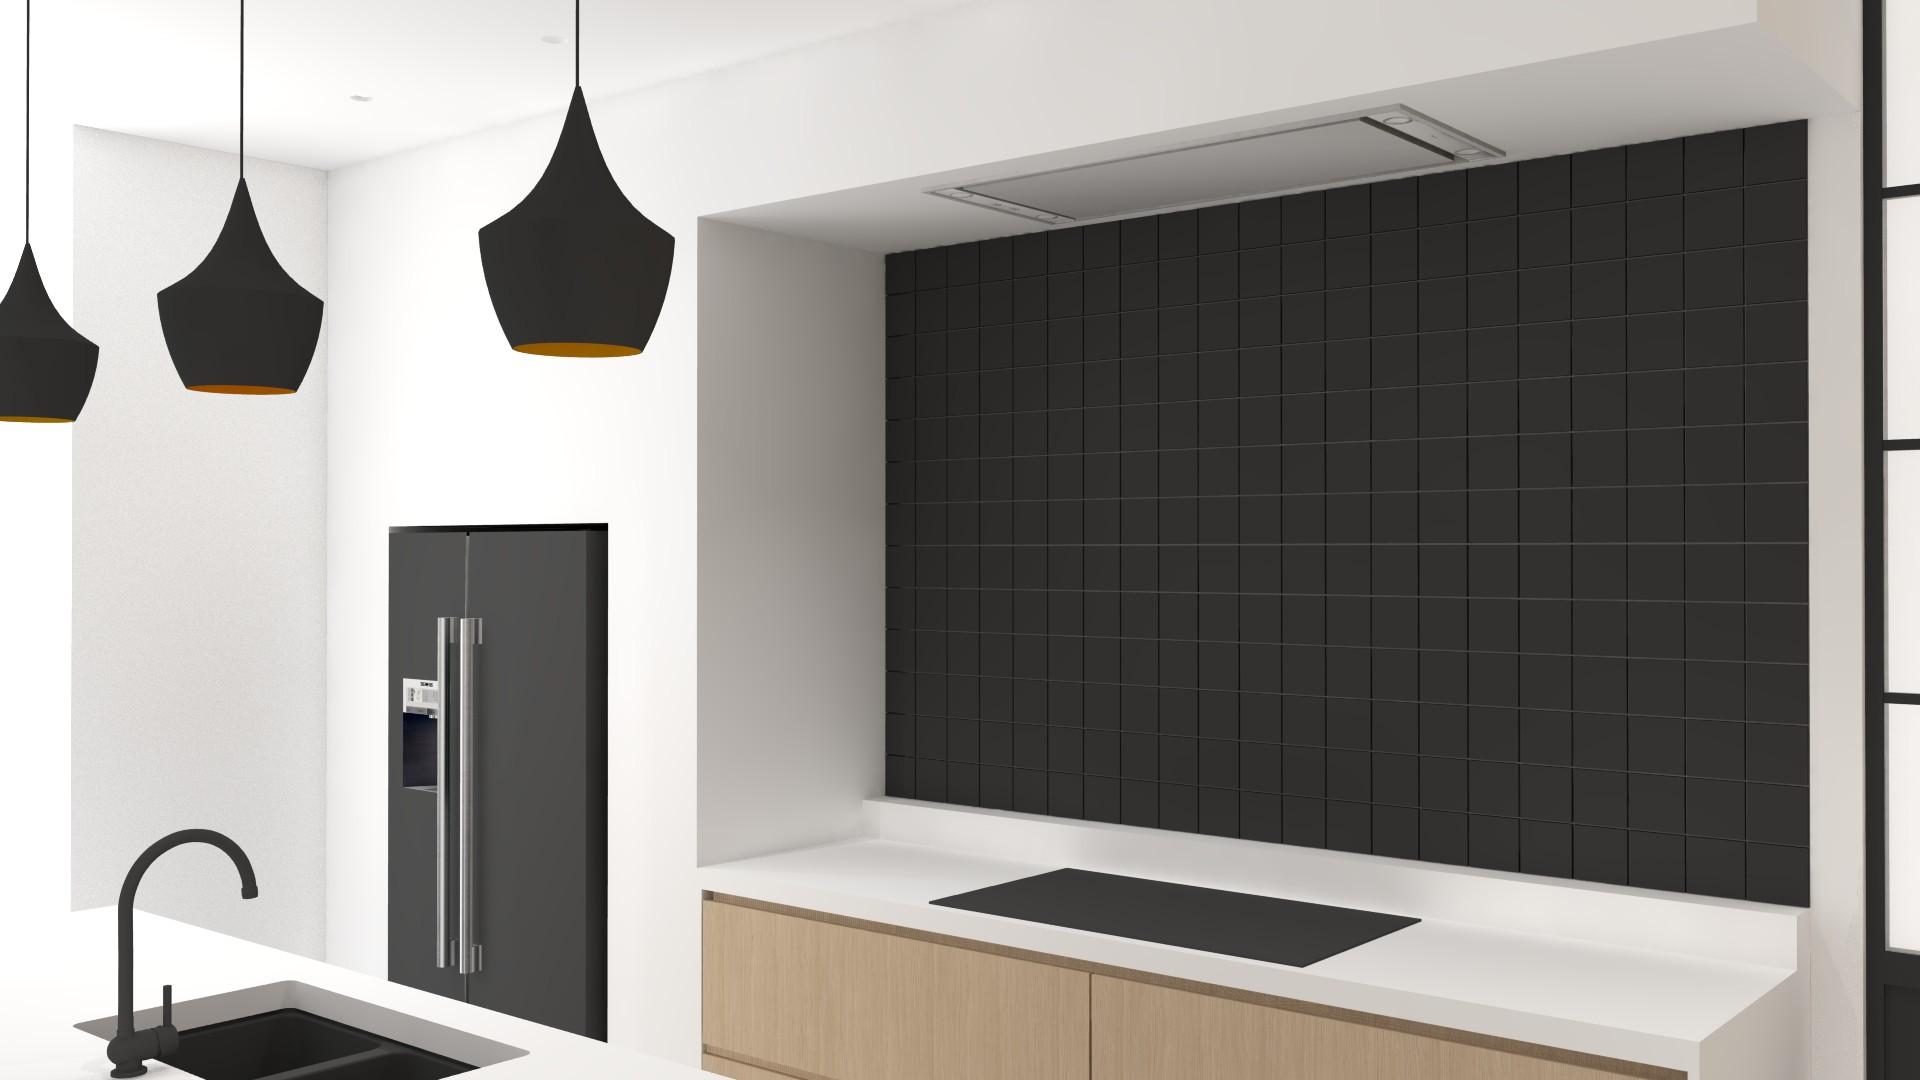 interieurarchitectuur nieuwbouw keuken